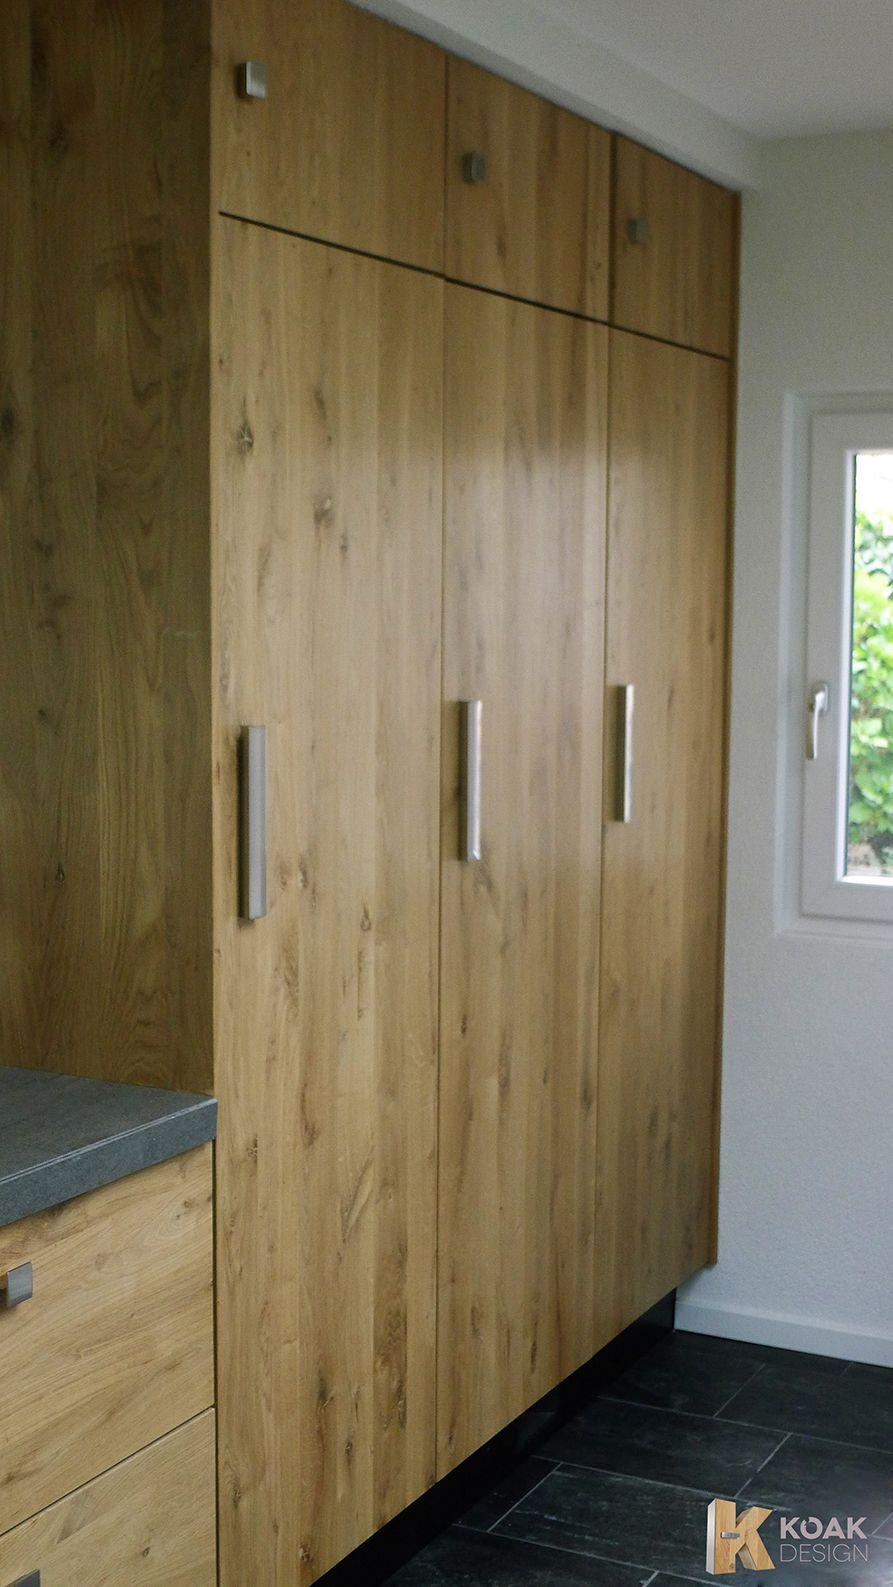 koak design ikea keuken our koak design kitchens pinterest van projects and design. Black Bedroom Furniture Sets. Home Design Ideas